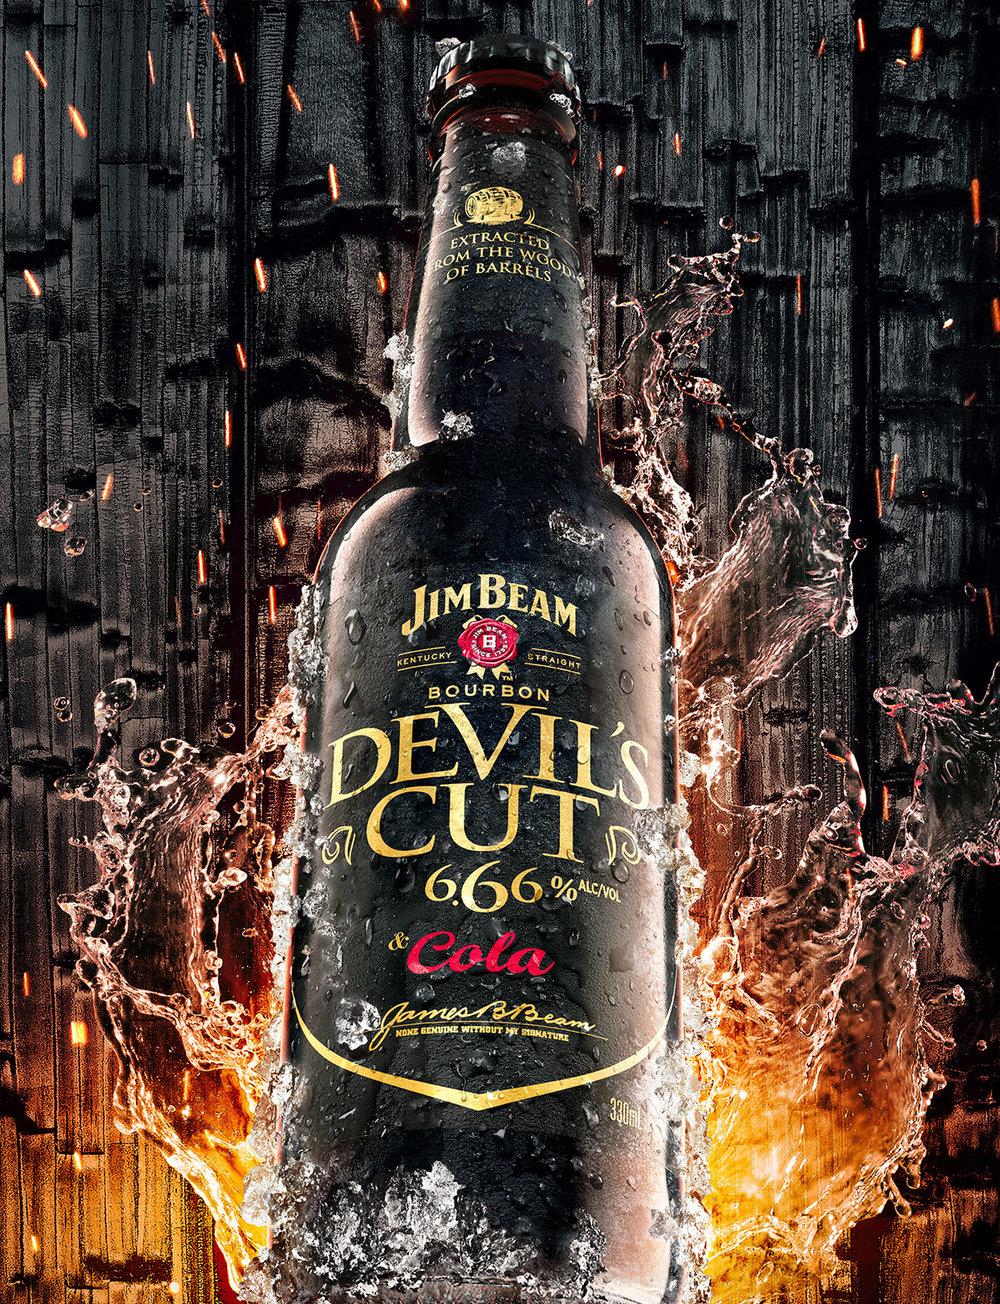 Devils_Cut_Bottle_Hero crop.jpg